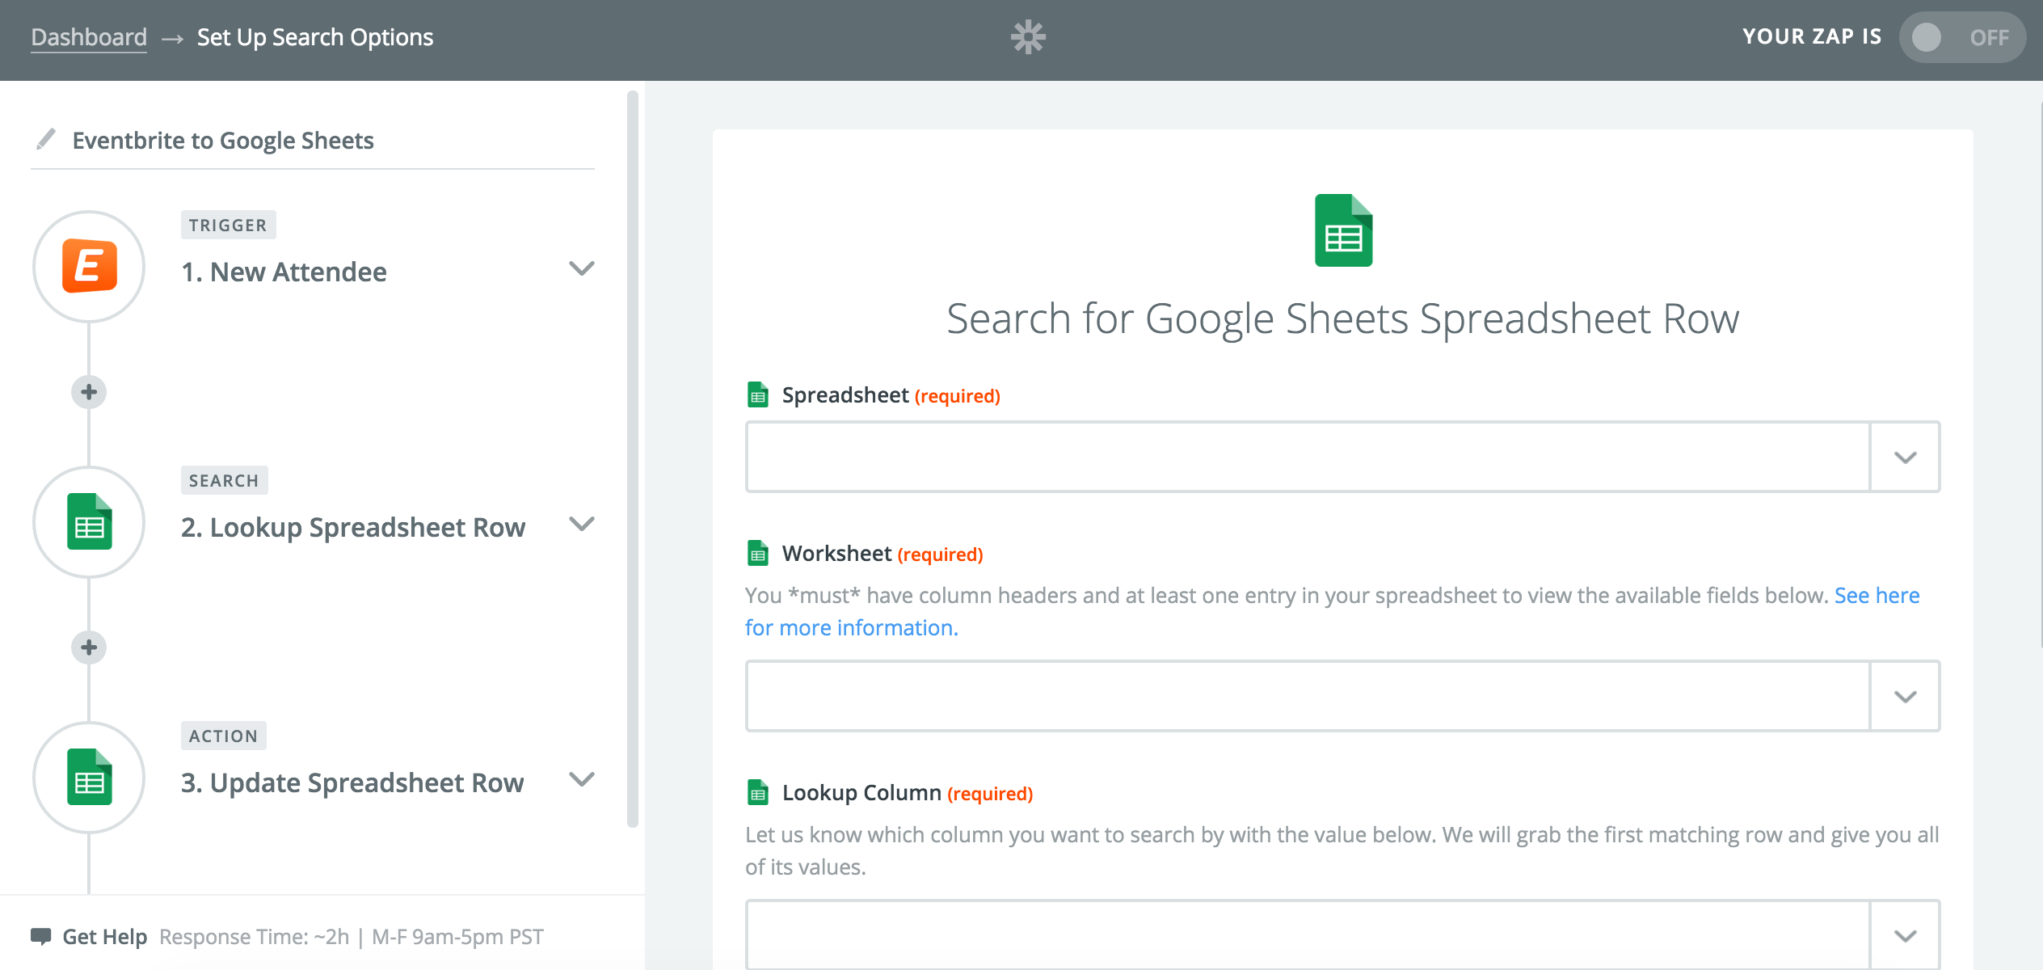 job search spreadsheet google sheets  Job Search Spreadsheet Google Sheets Regarding Automate Google Sheets: Search For Existing Rows  Updates  Zapier Job Search Spreadsheet Google Sheets Google Spreadshee